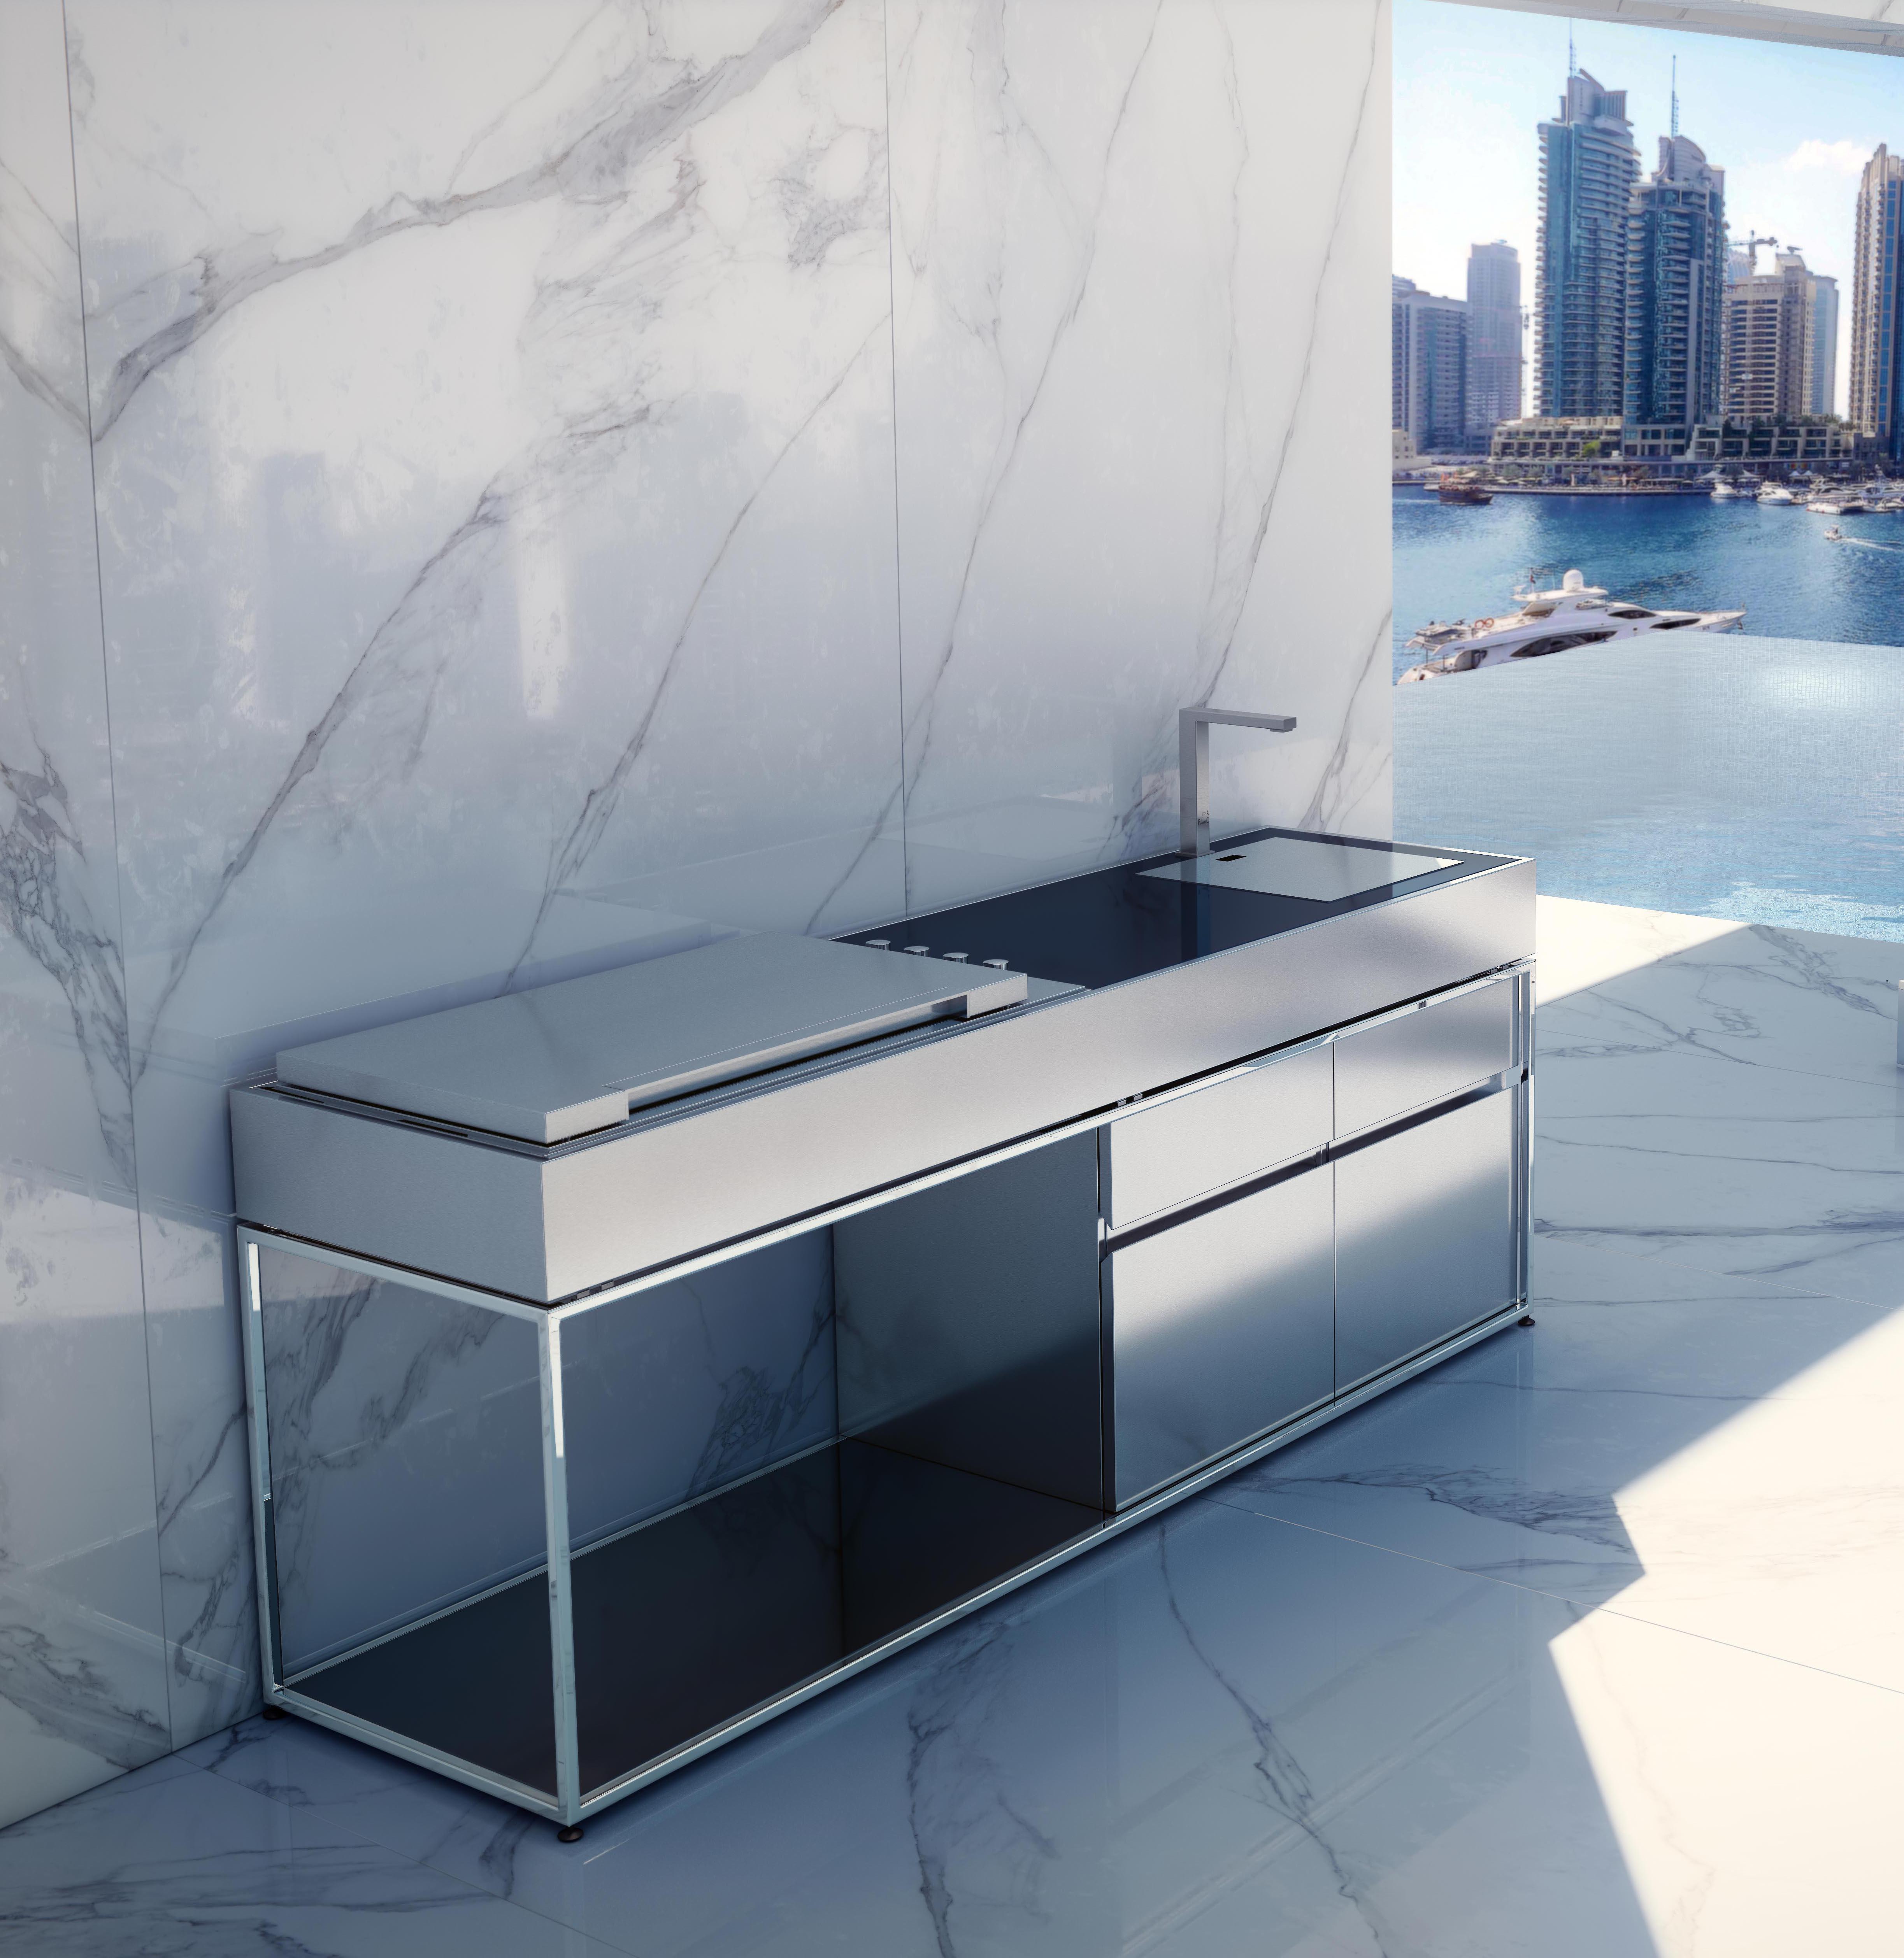 Sleek Kitchen Island BBQ Gas Grill - Couture Outdoor